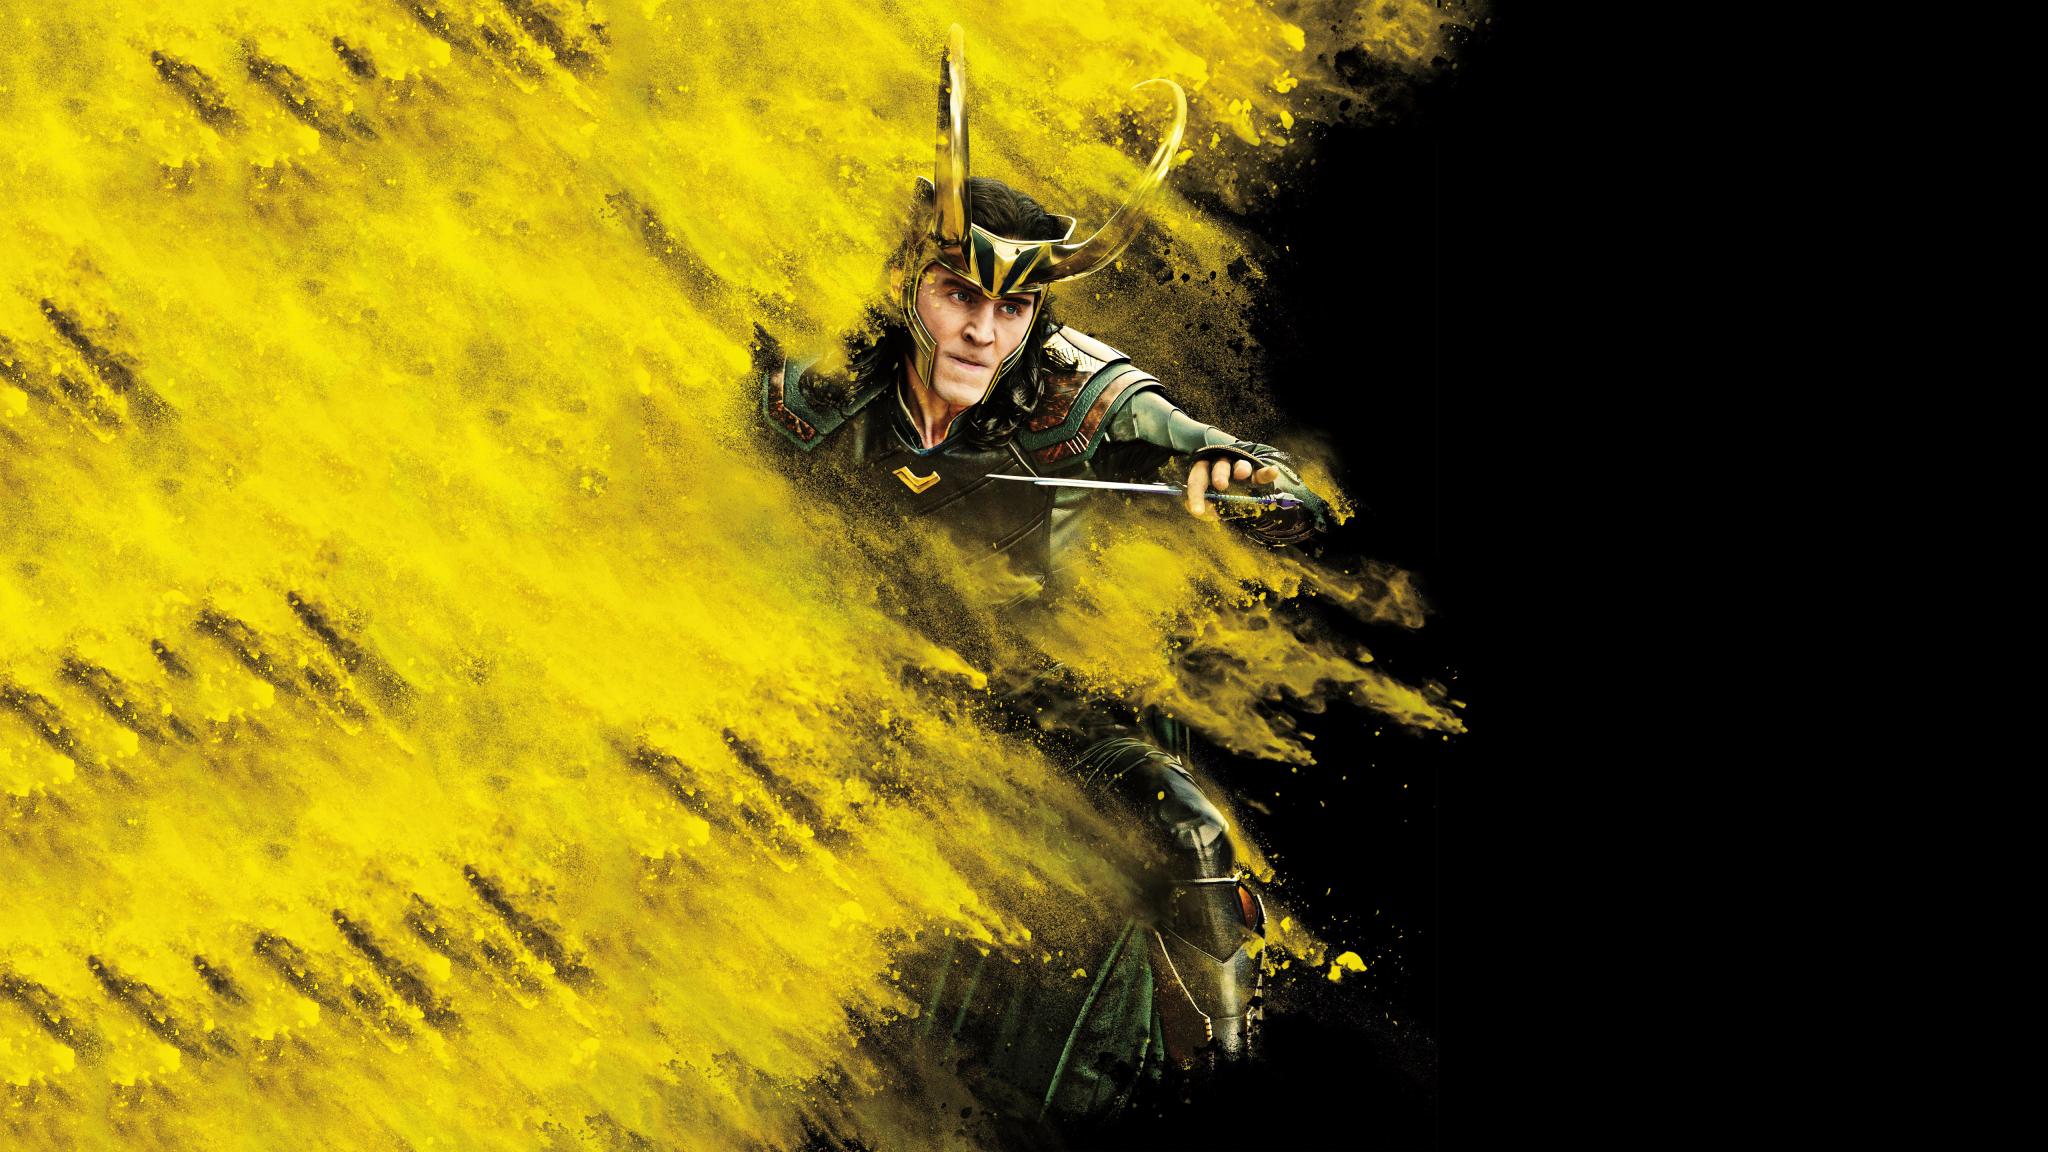 Loki thor ragnarok 2017 hd 4k wallpaper - Thor ragnarok hd wallpapers download ...